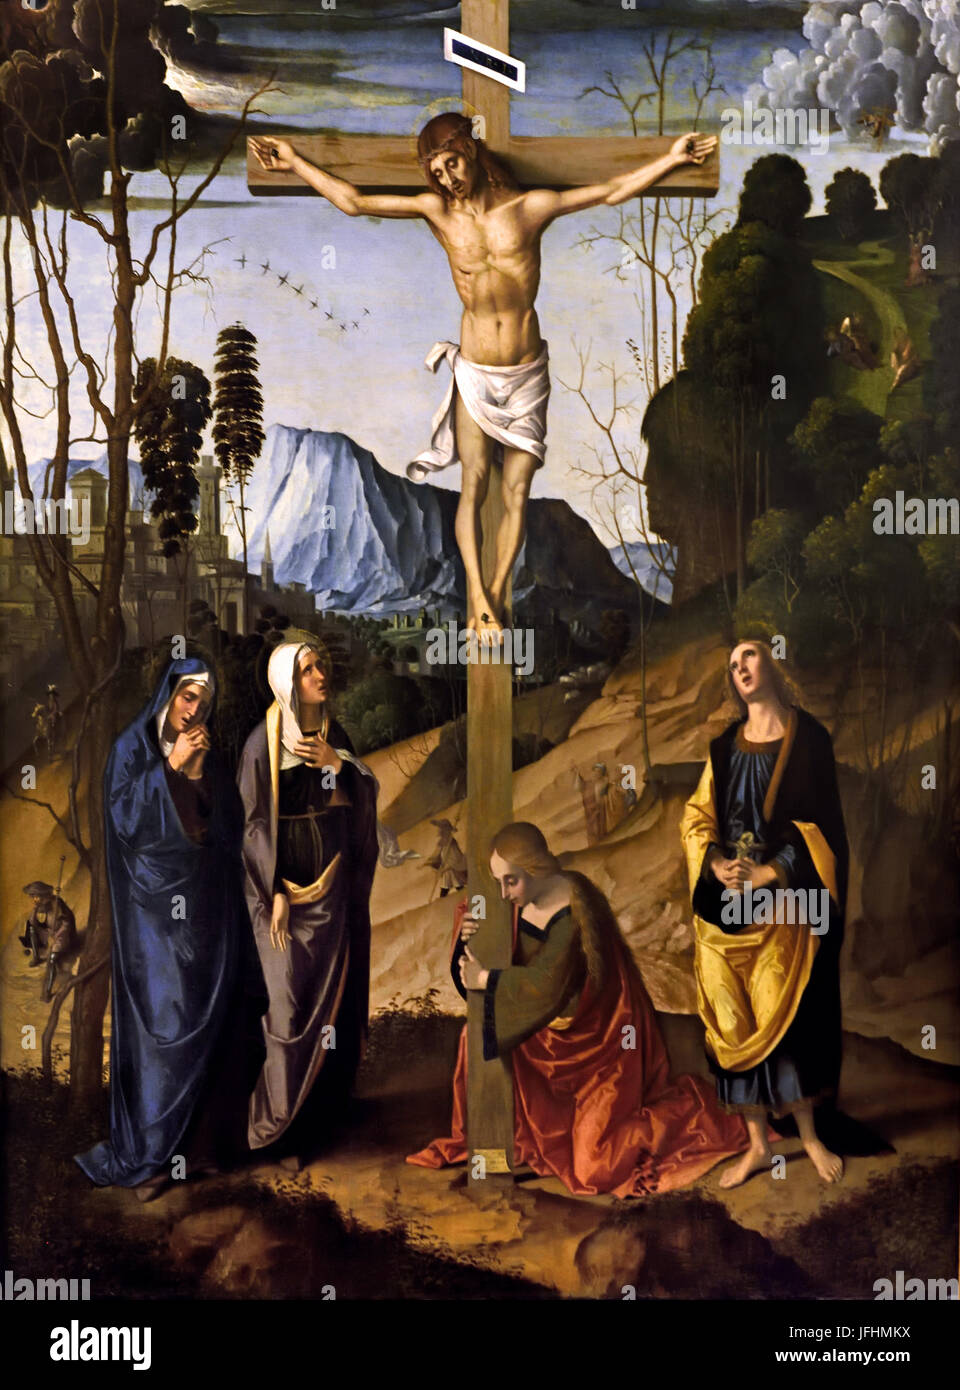 Crucifixion 1500 Marco Palmezzano 1459-1539 Italy Italian - Stock Image